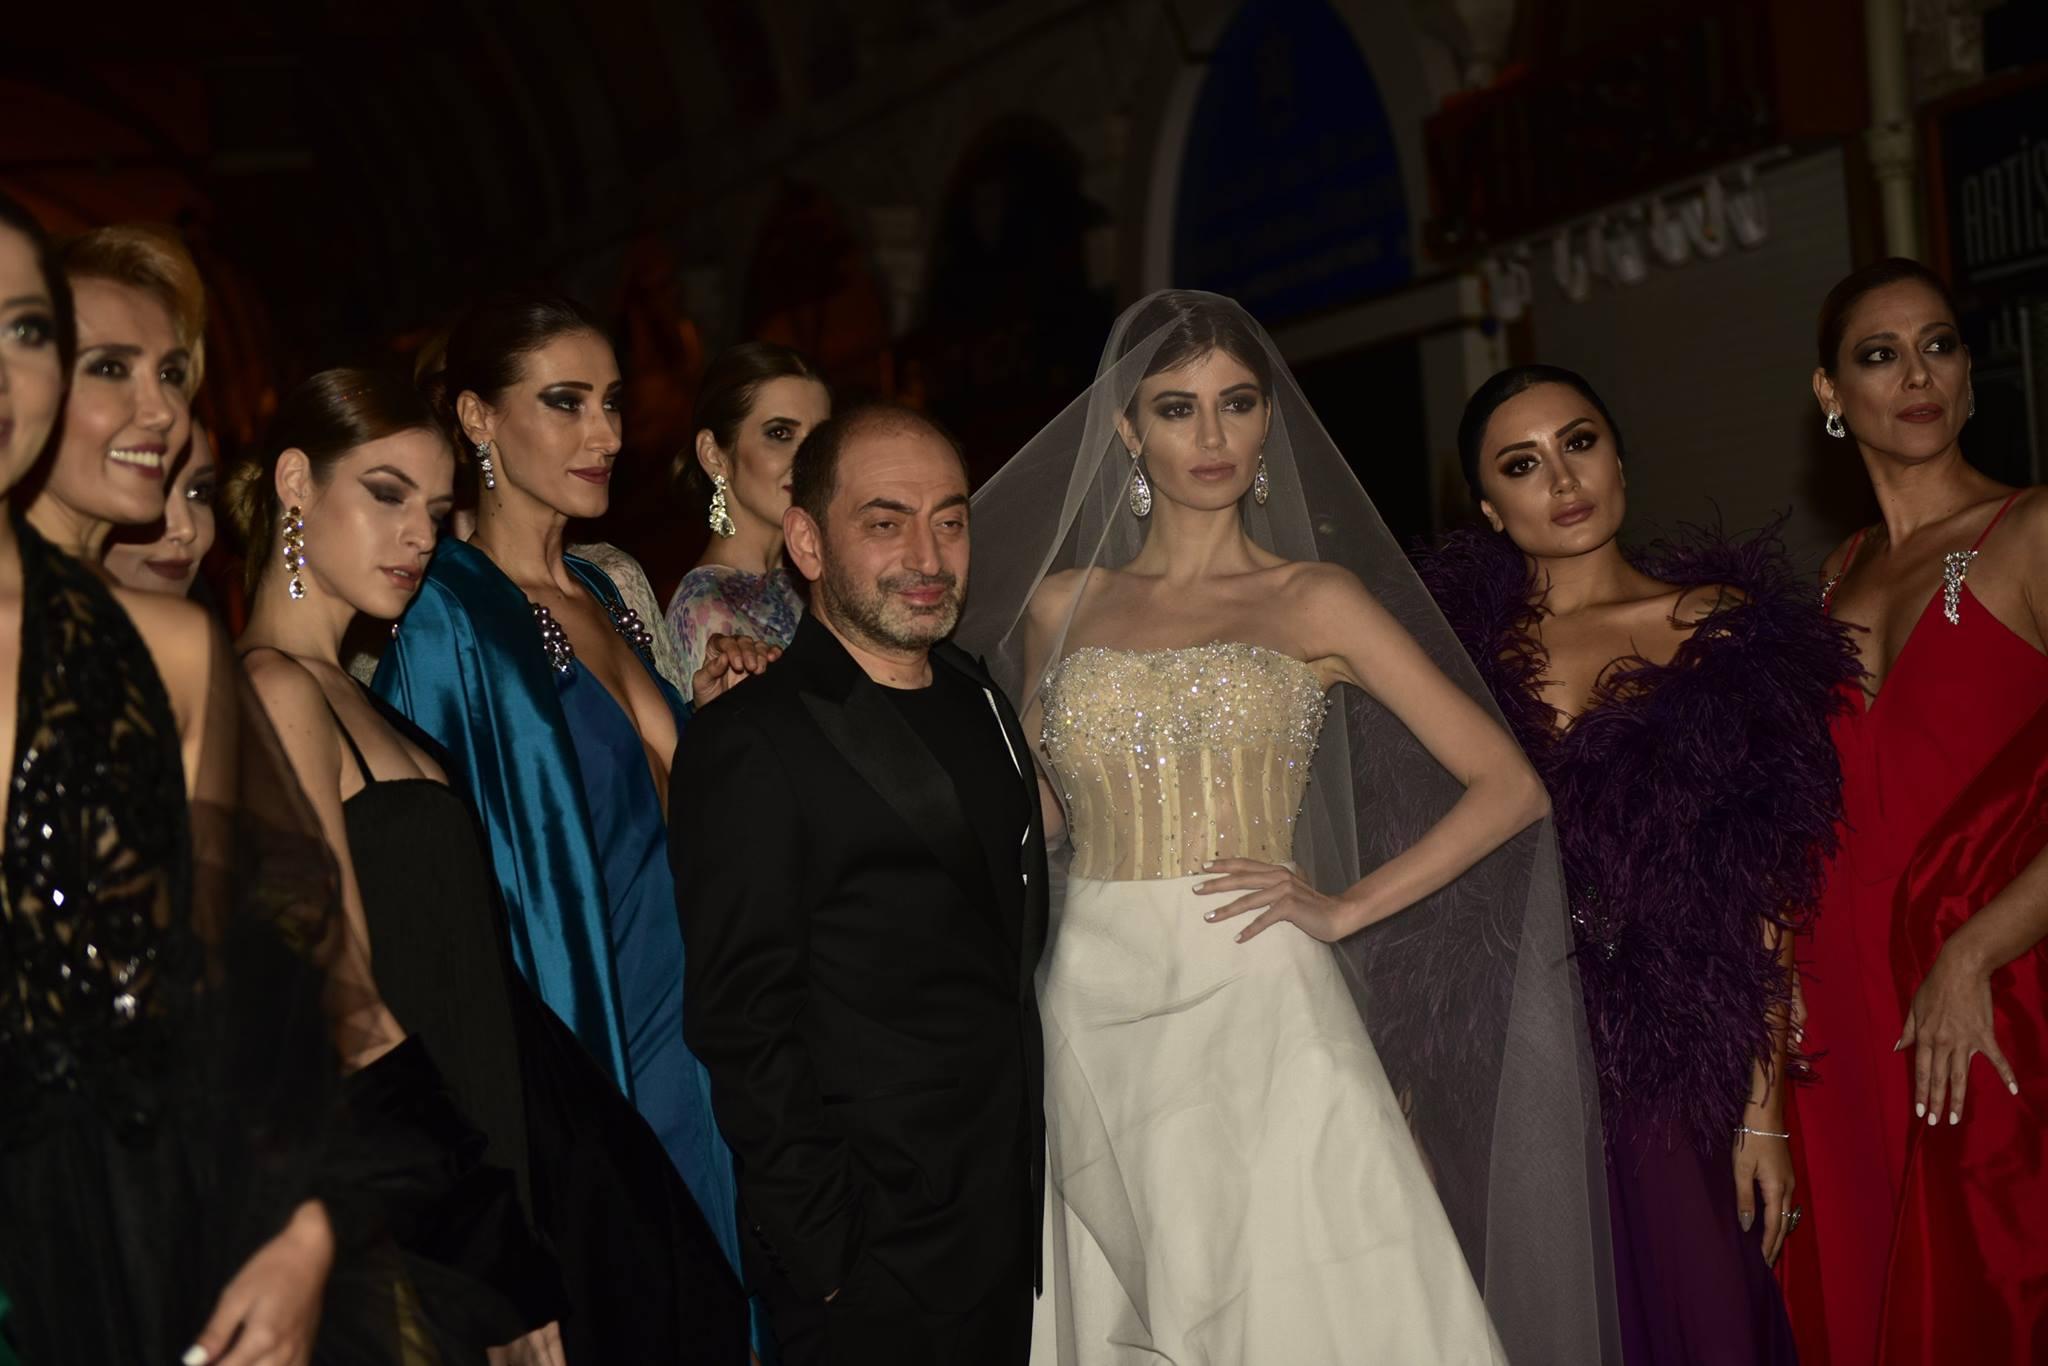 Kapalıçarşı'da Mehmet Köymen LESAIRA Winter 2018 Haute Couture defilesi